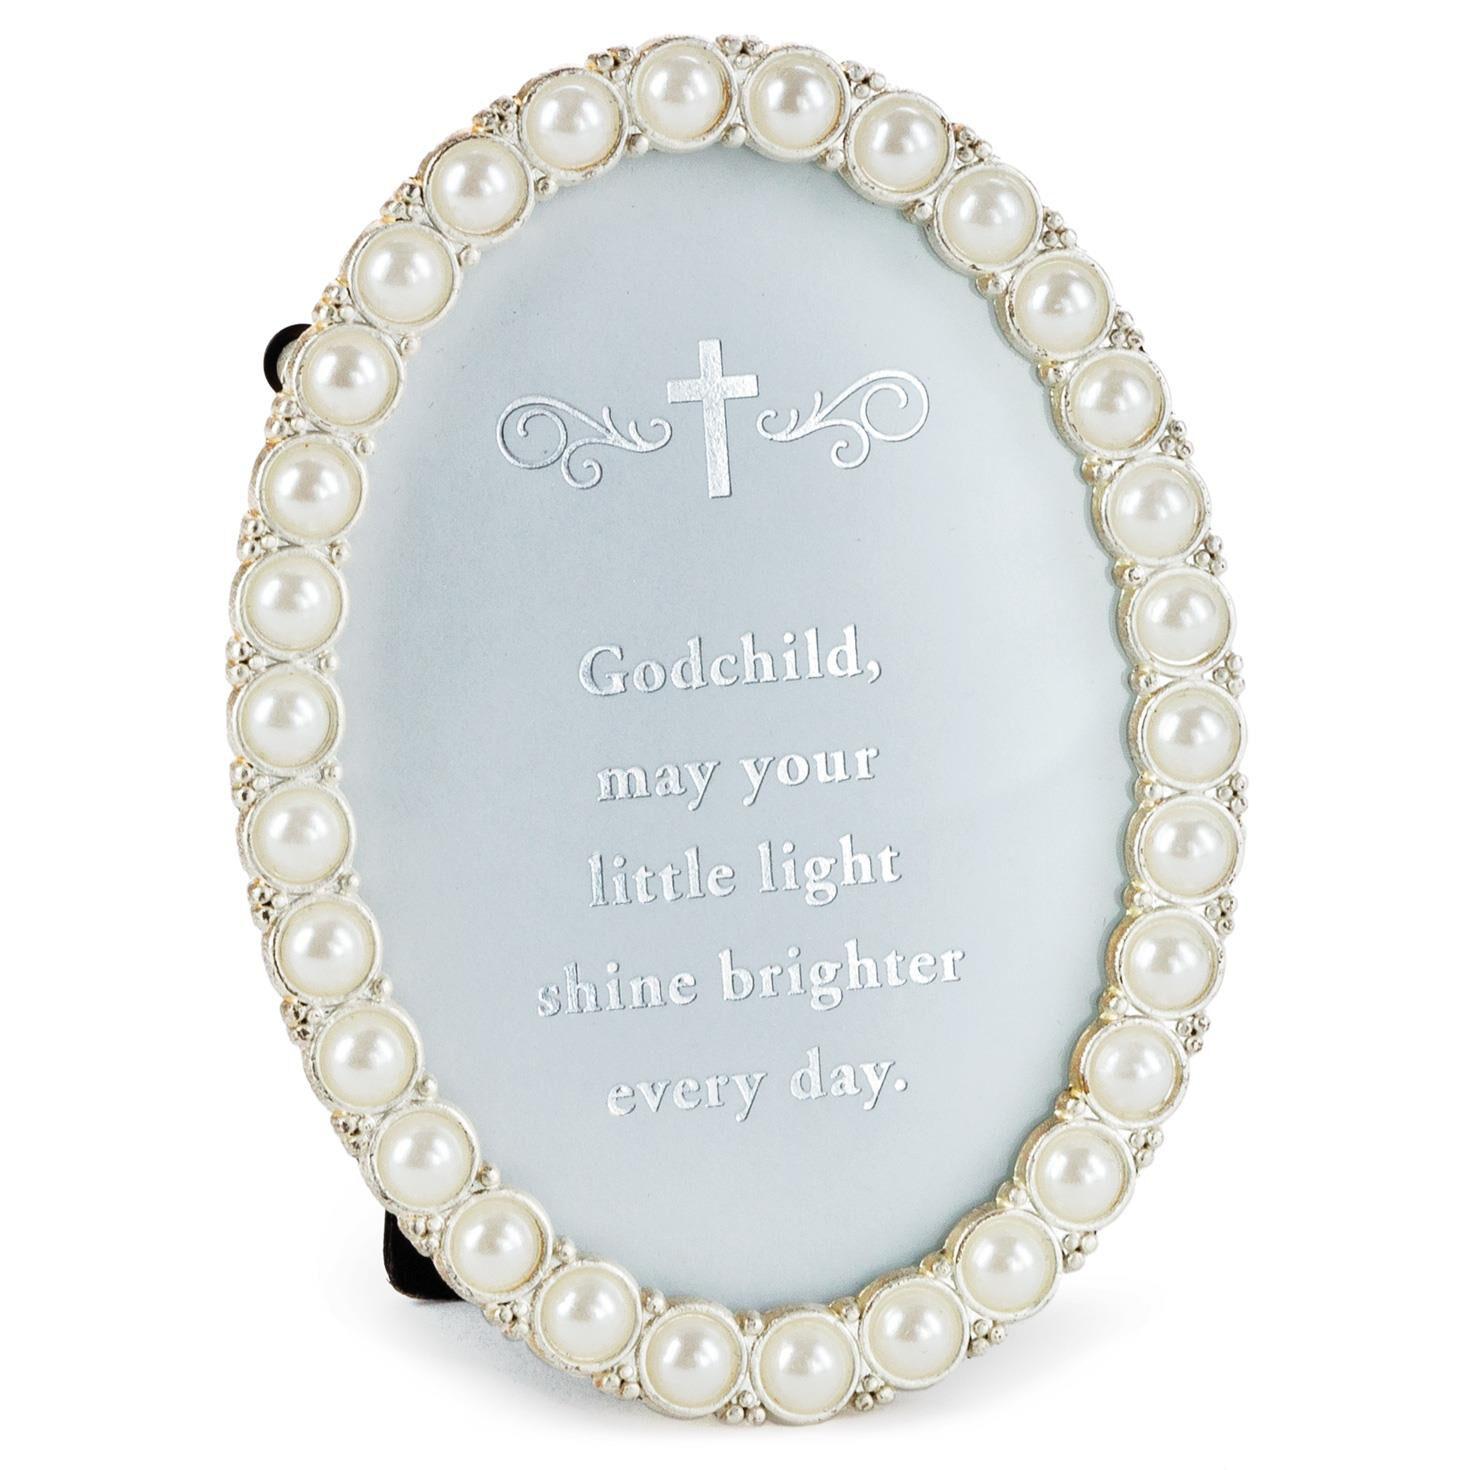 shine brighter godchild baptism message in faux pearl frame decorative accessories hallmark